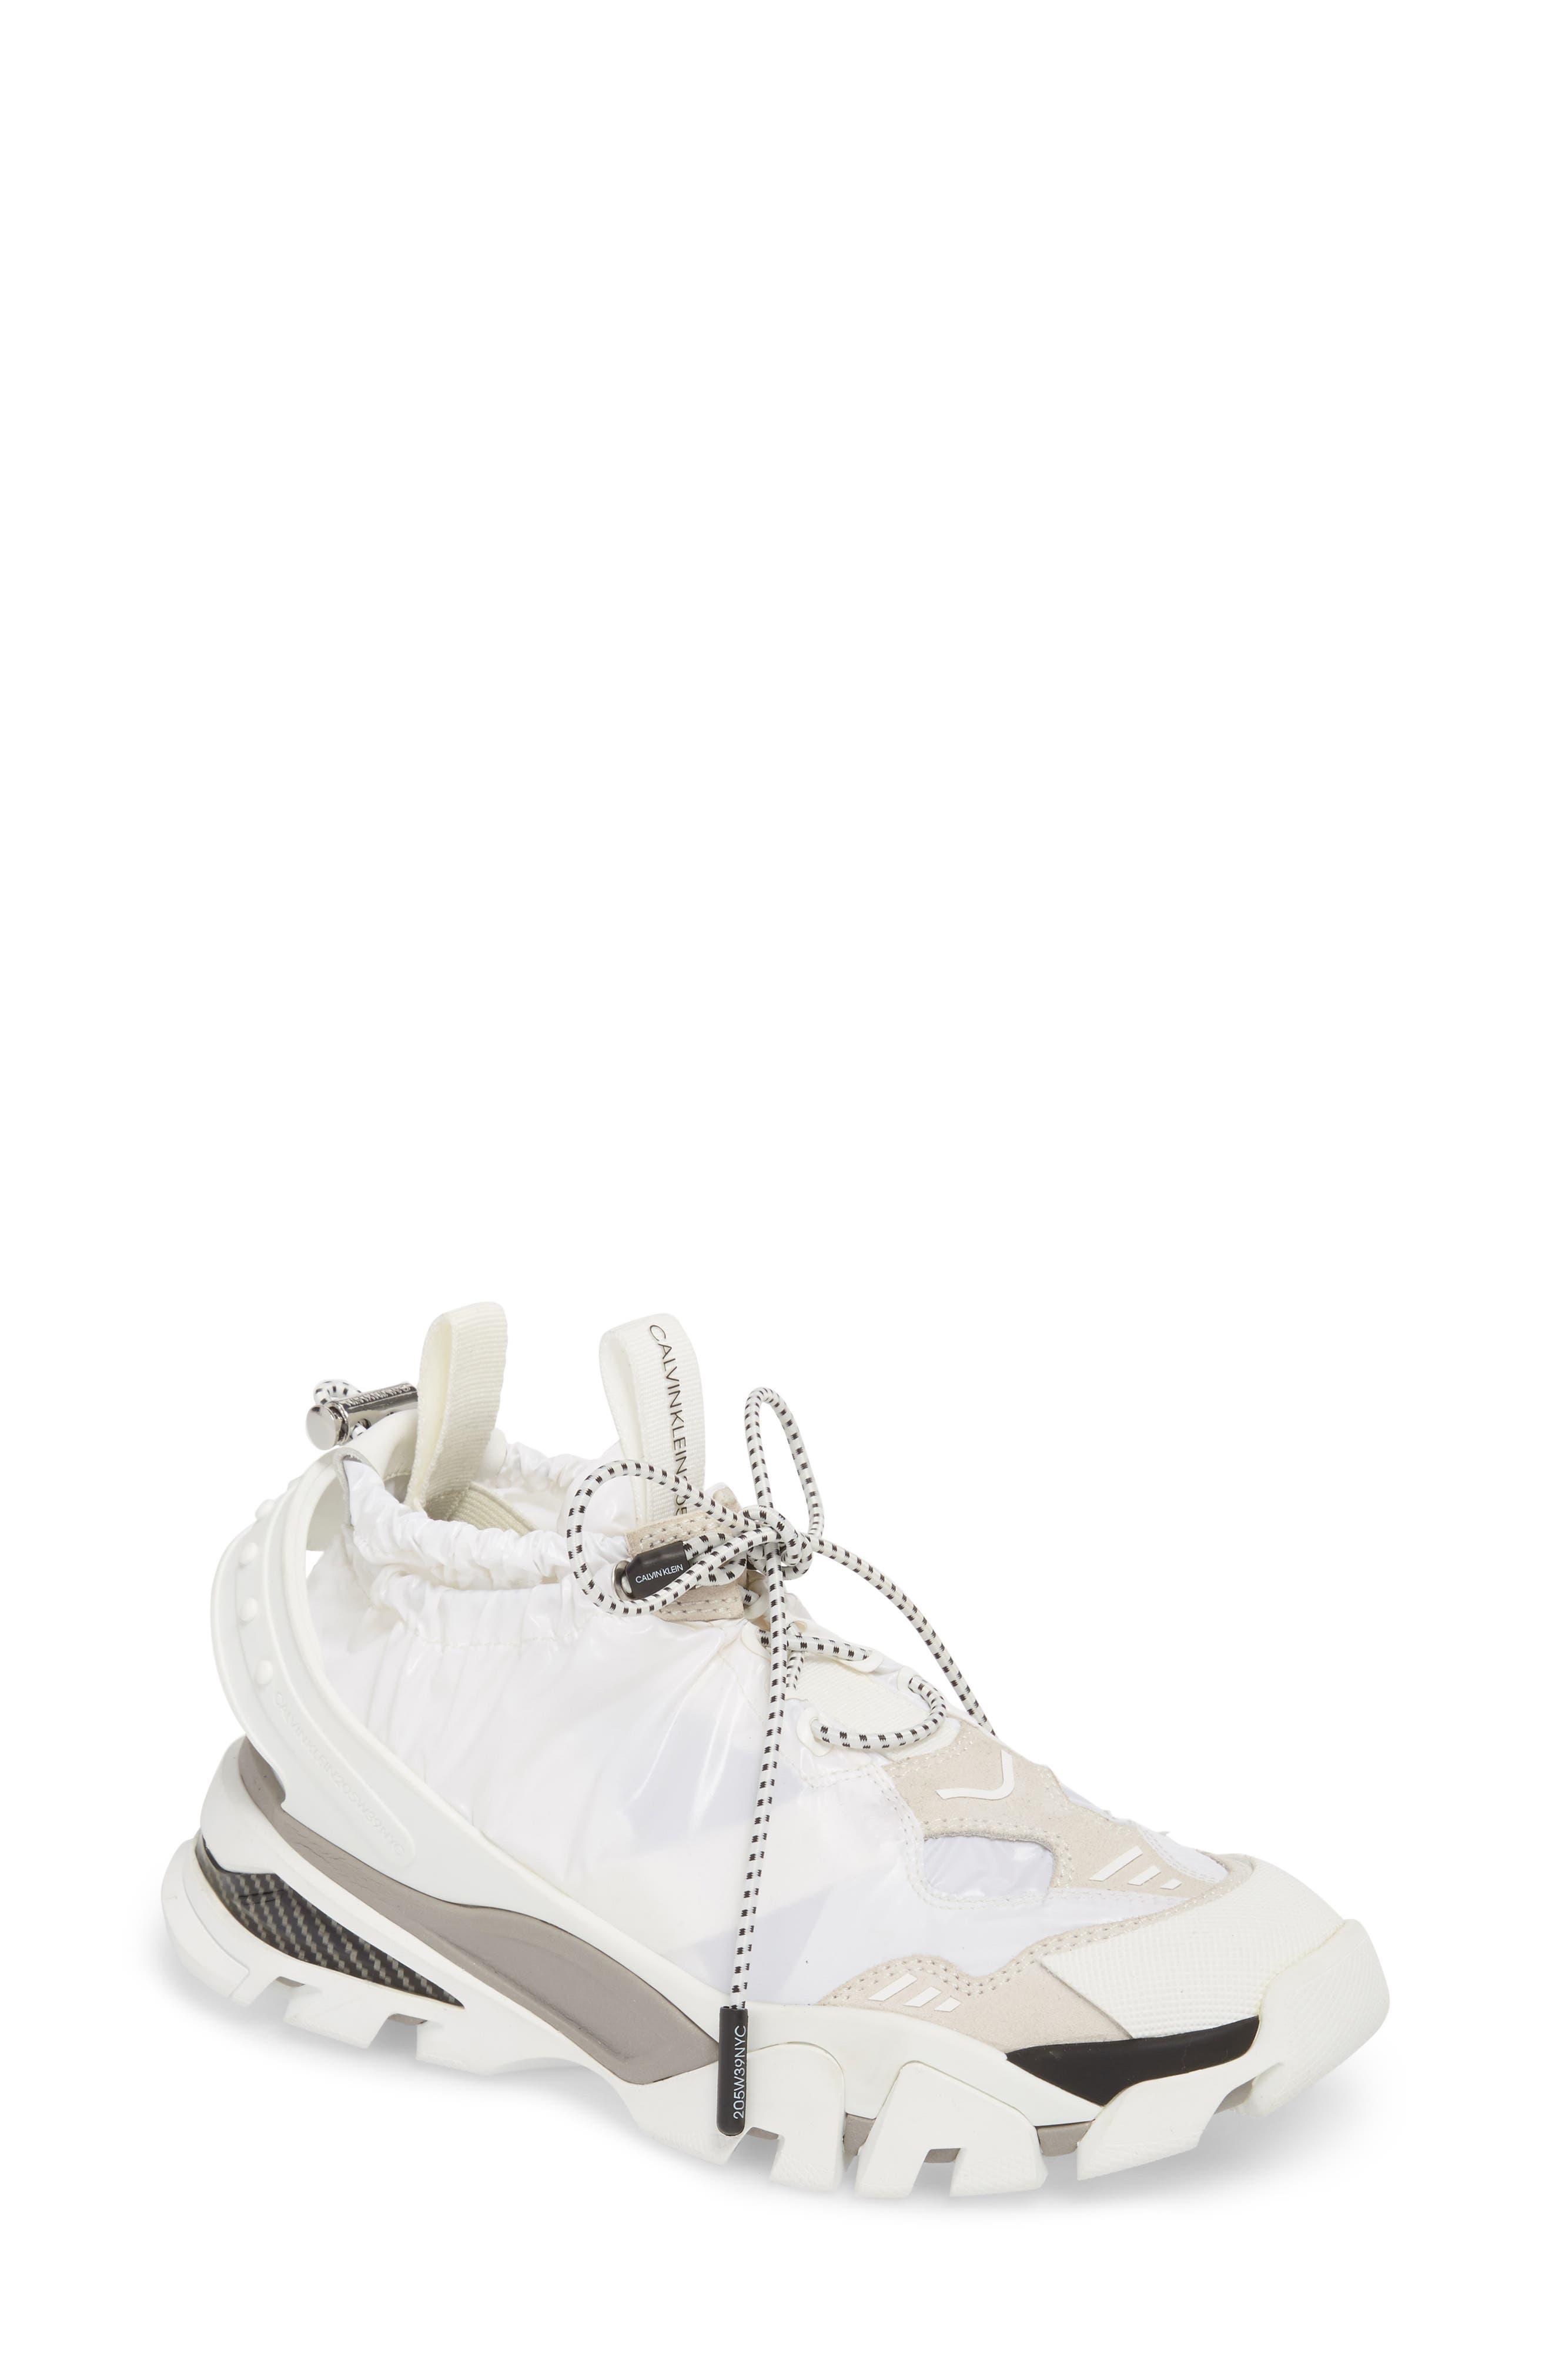 CALVIN KLEIN 205W39NYC,                             Candessa Slip-On Sneaker,                             Main thumbnail 1, color,                             100